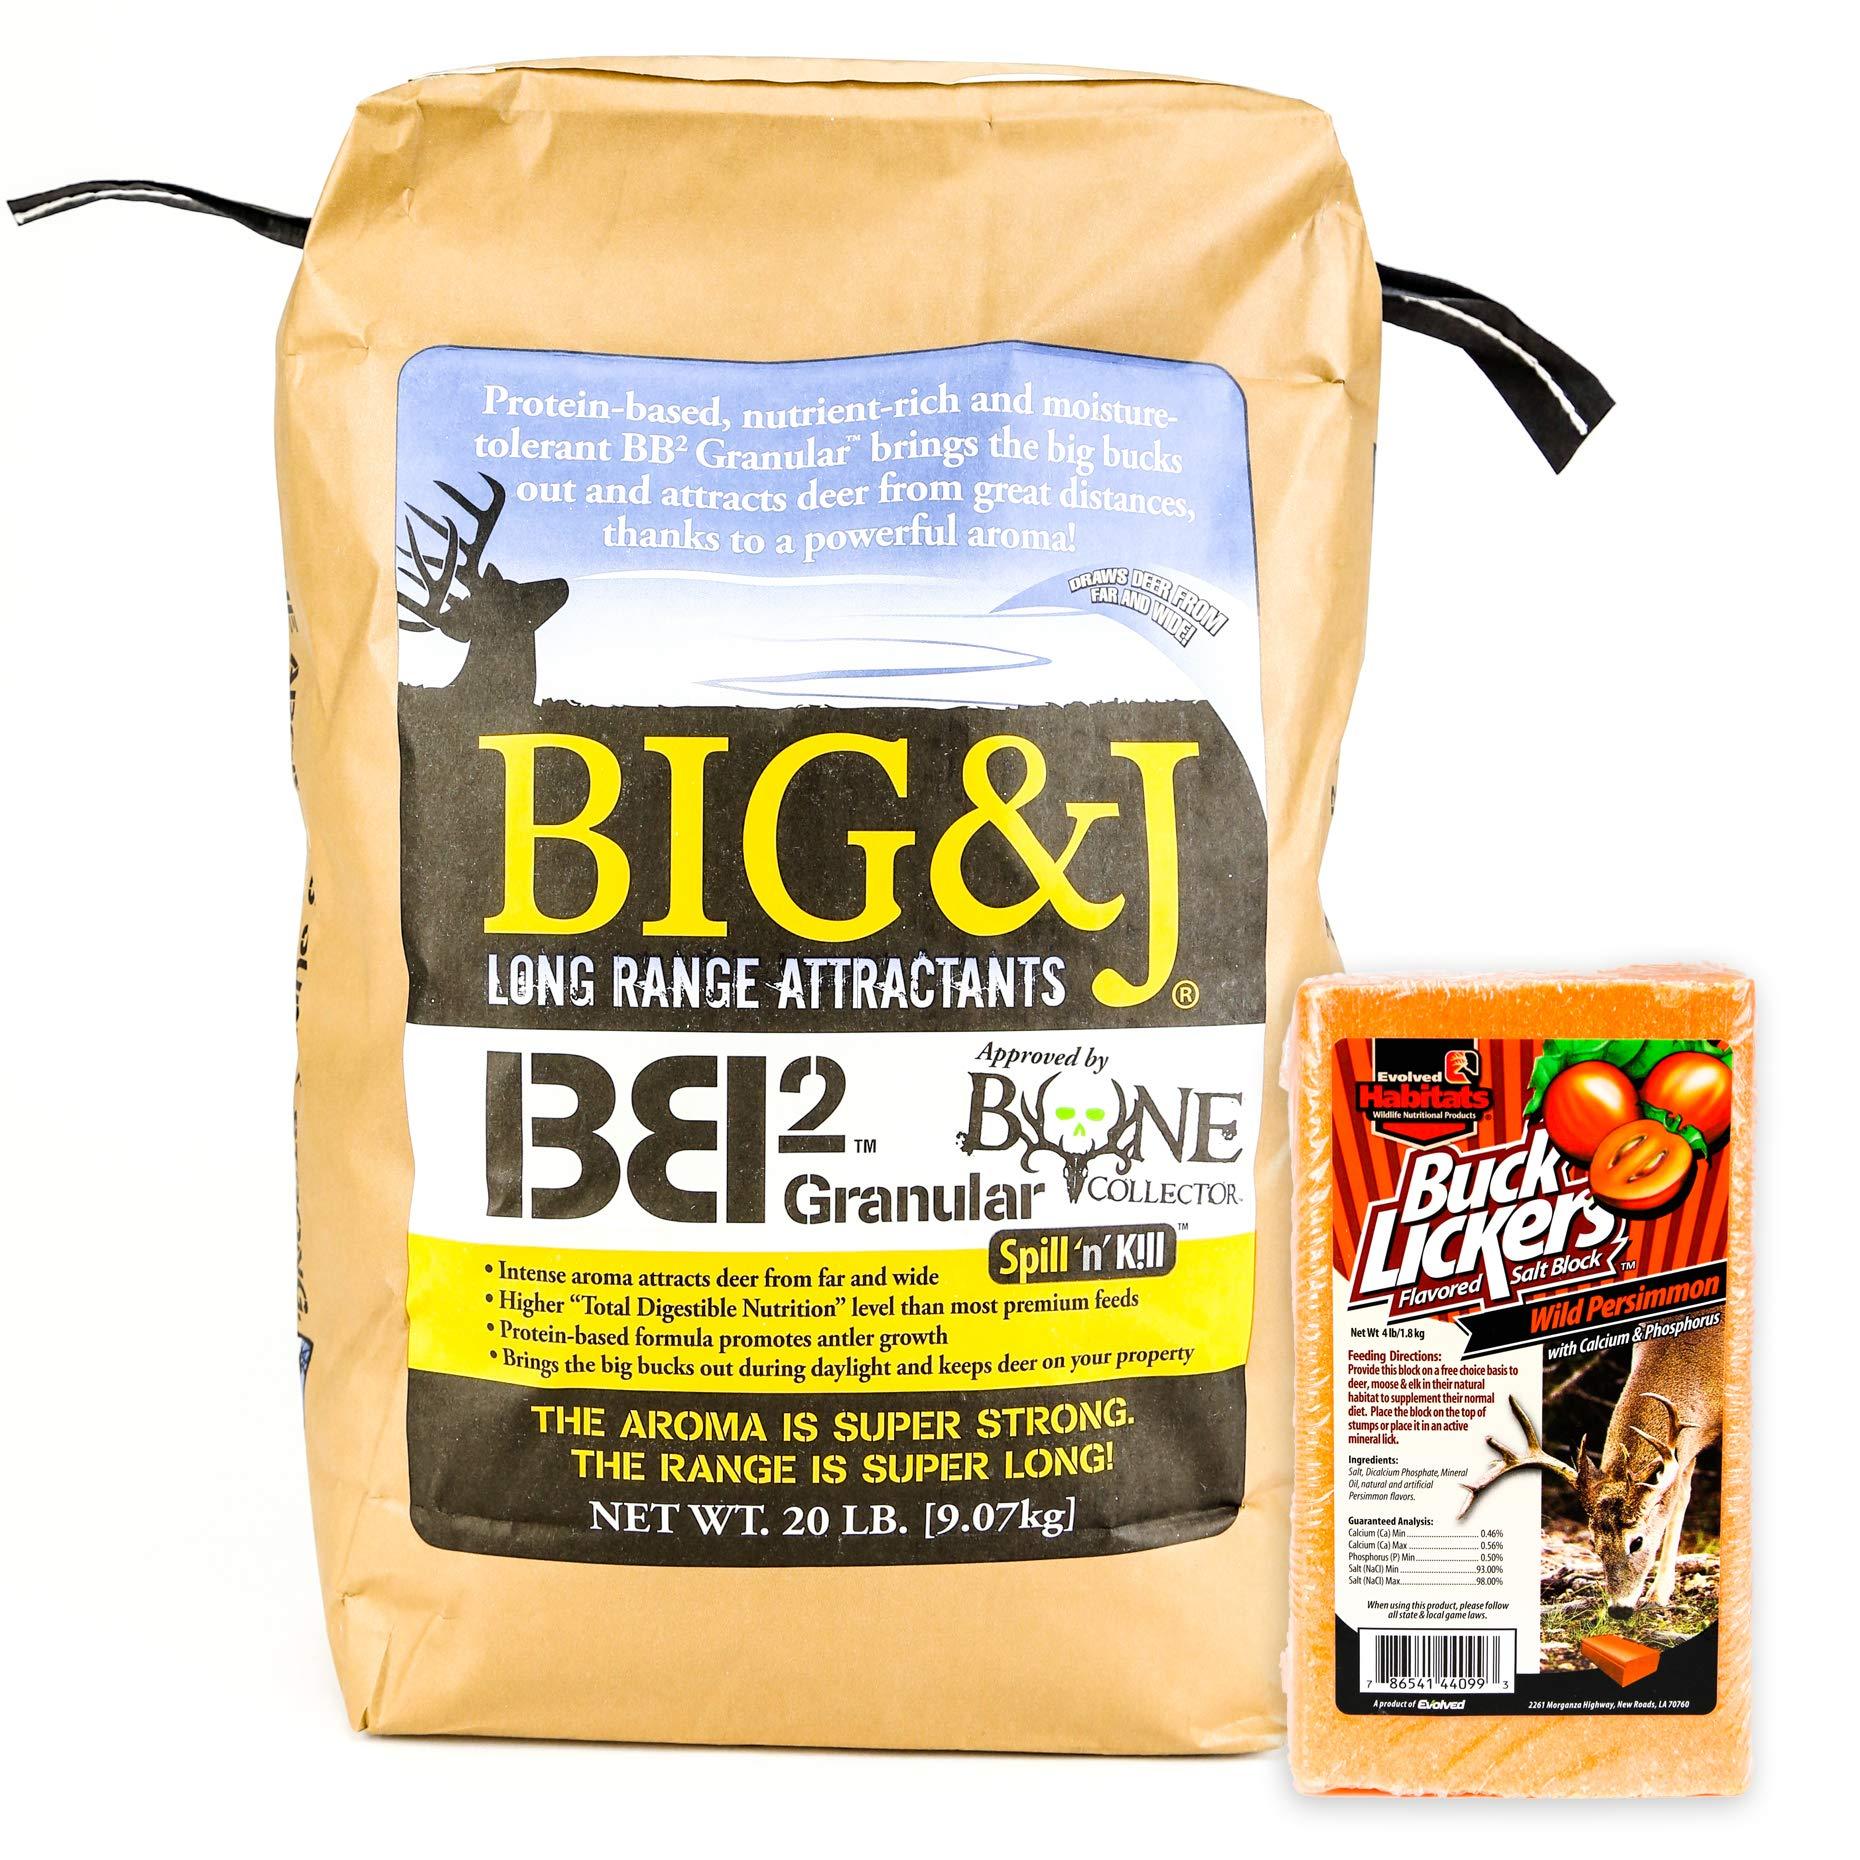 Bundles by Creative Home Store Big & J BB2 Granular Long Range Deer Feed/Attractant - 20 LB & Evolved Habitats Buck Lickers Persimmons Flavored Salt Brick - 4 LB Set (2 Items) by Bundles by Creative Home Store